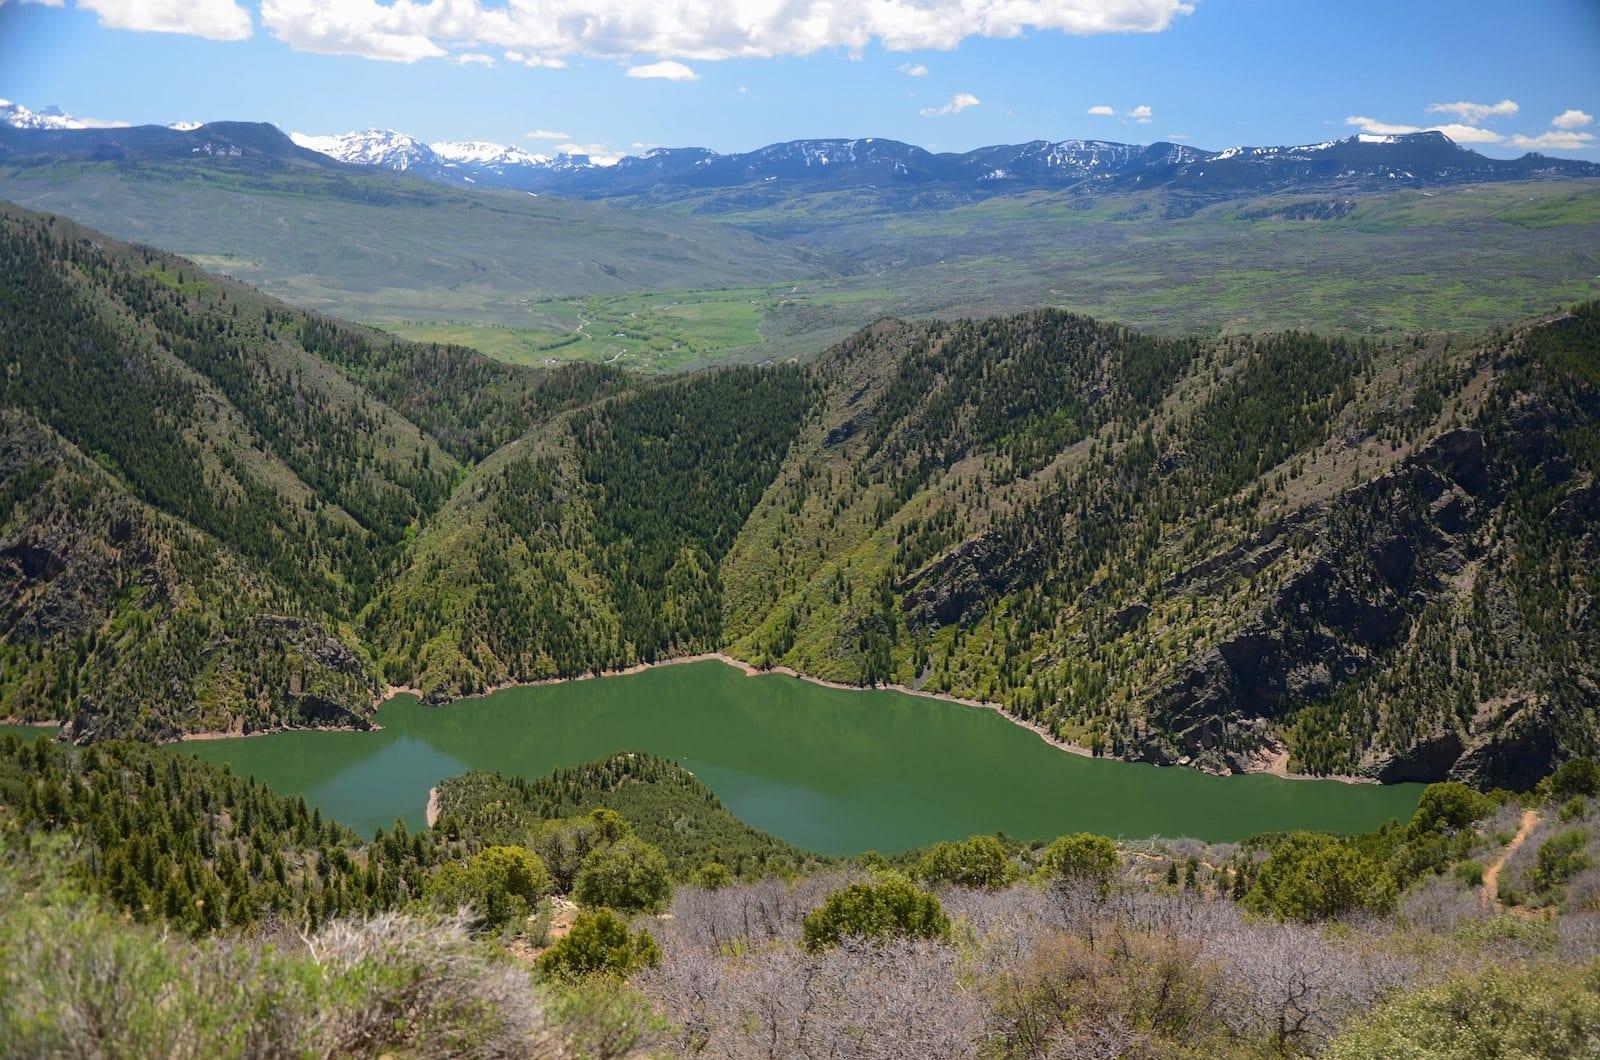 Morrow Point Reservoir Curecanti National Recreation Area Colorado